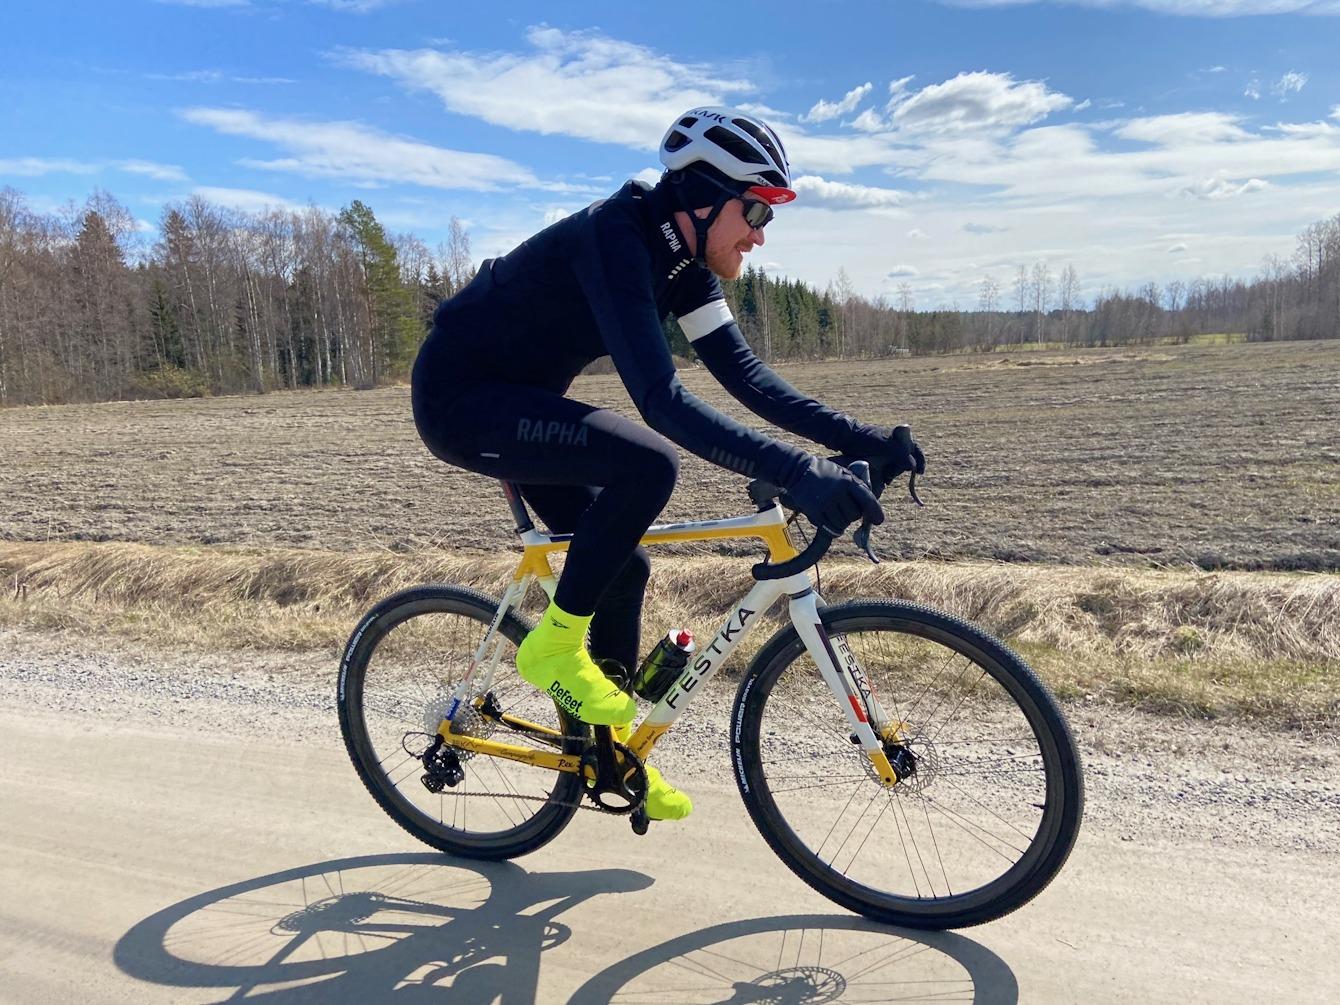 festka antti bicycle